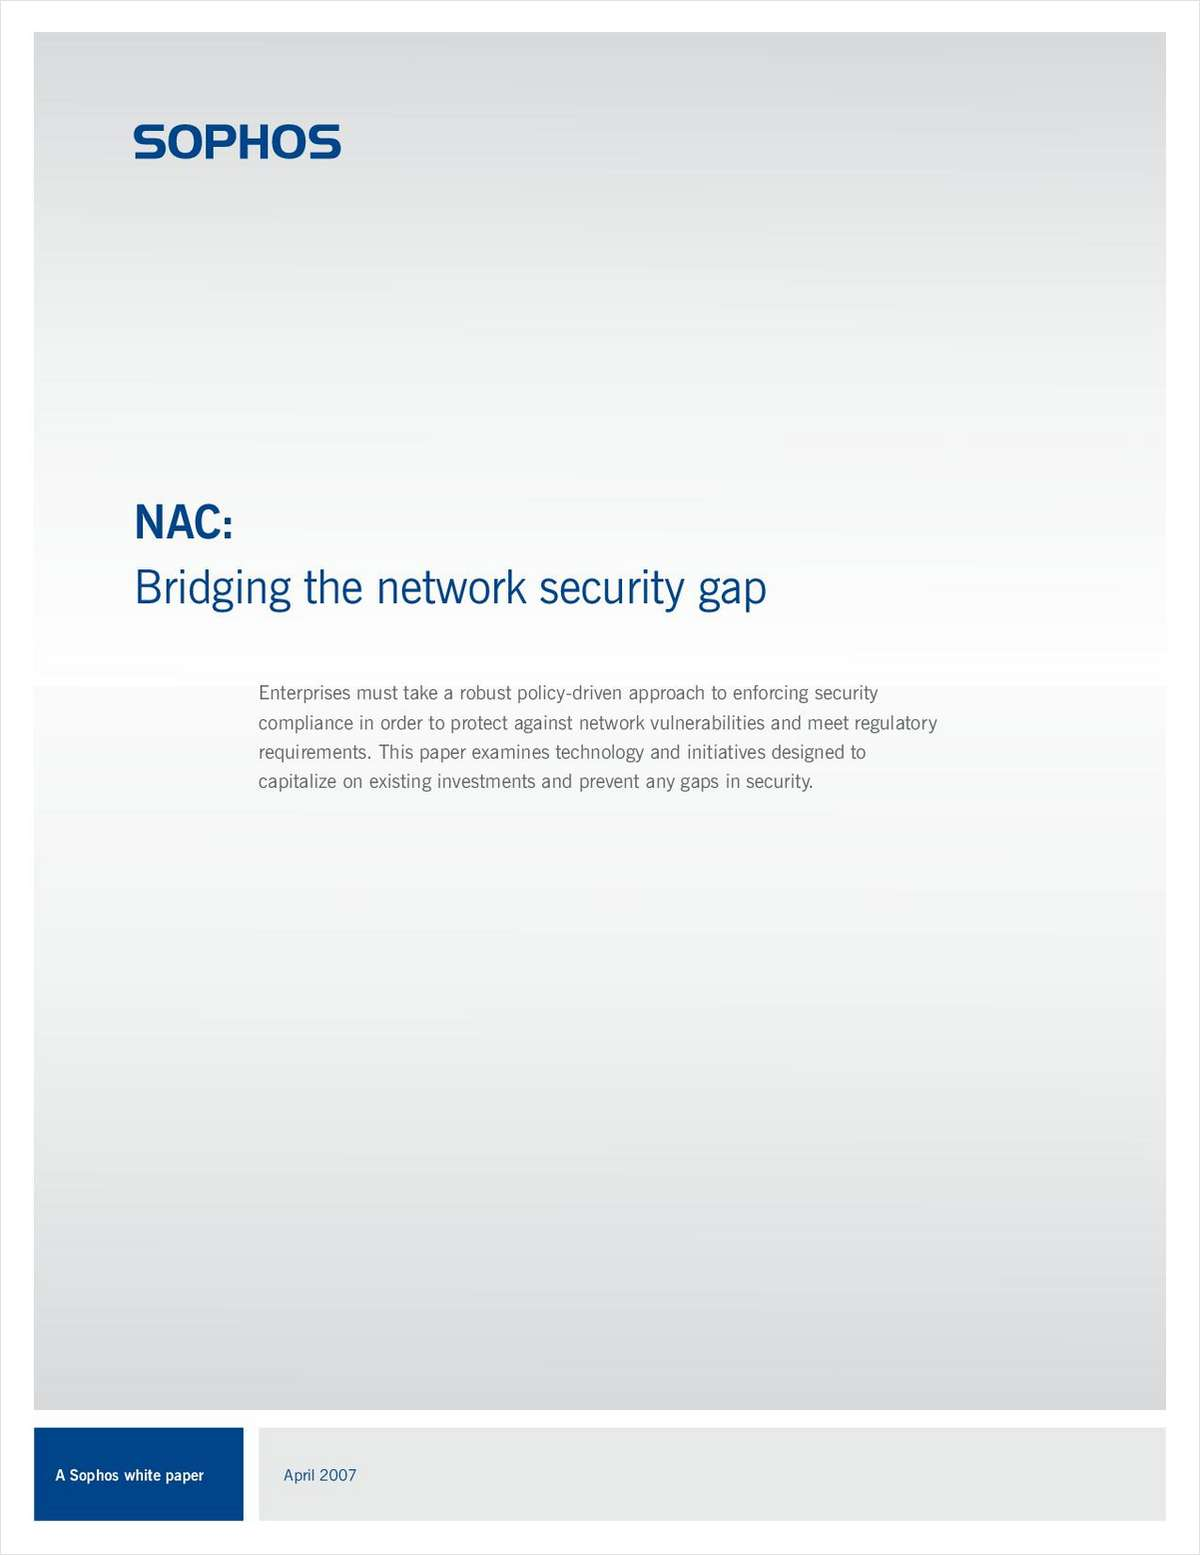 NAC: Bridging the Network Security Gap